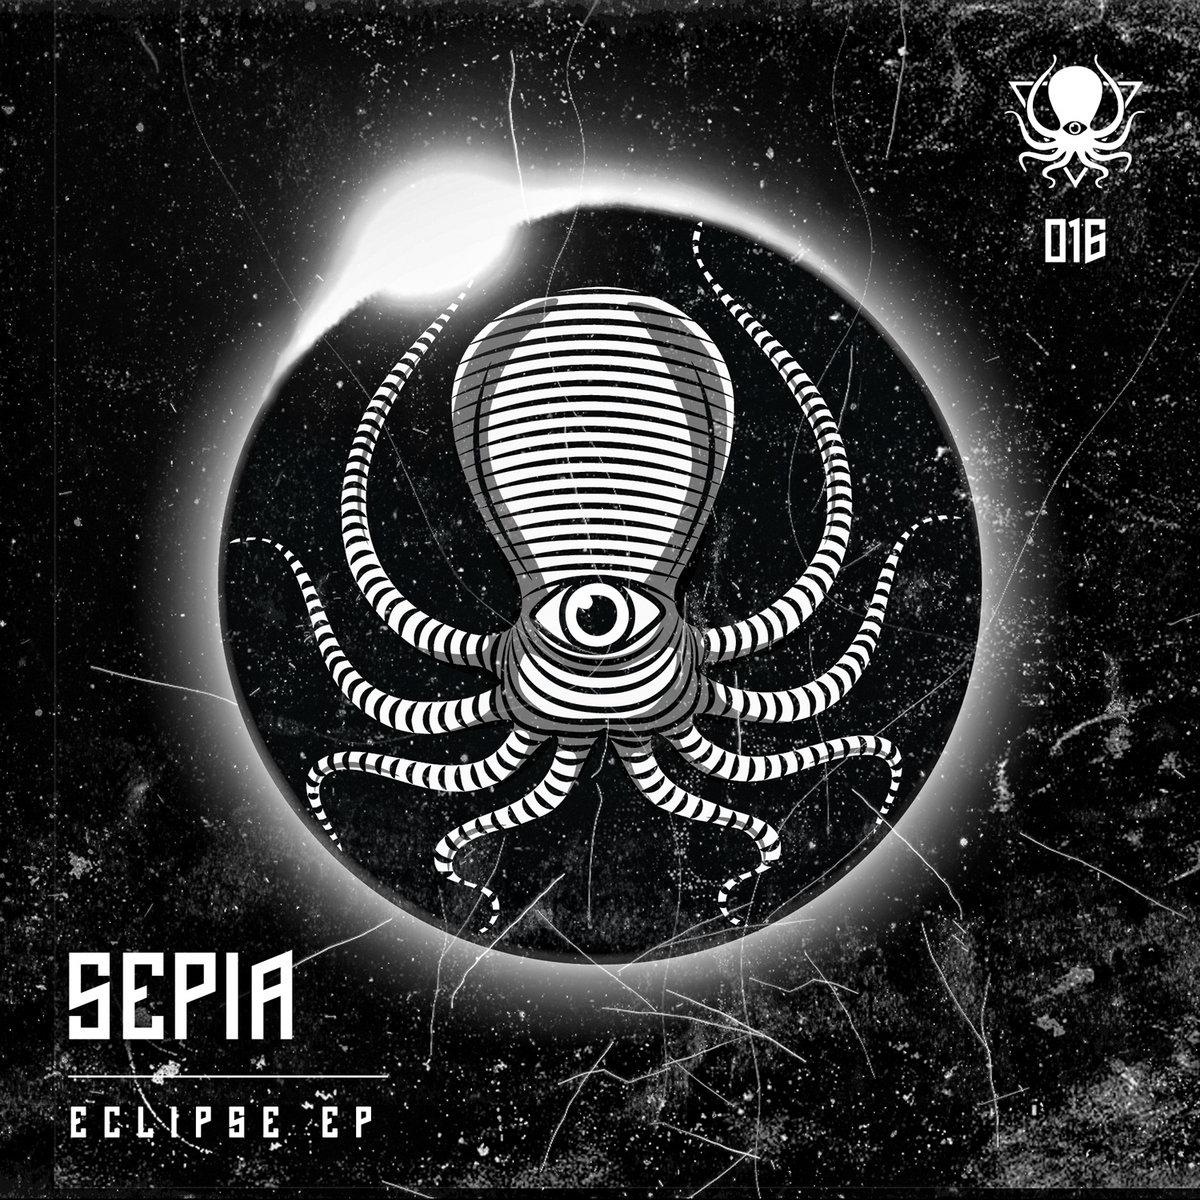 Sepia - Point Blank | Deep Dark & Dangerous